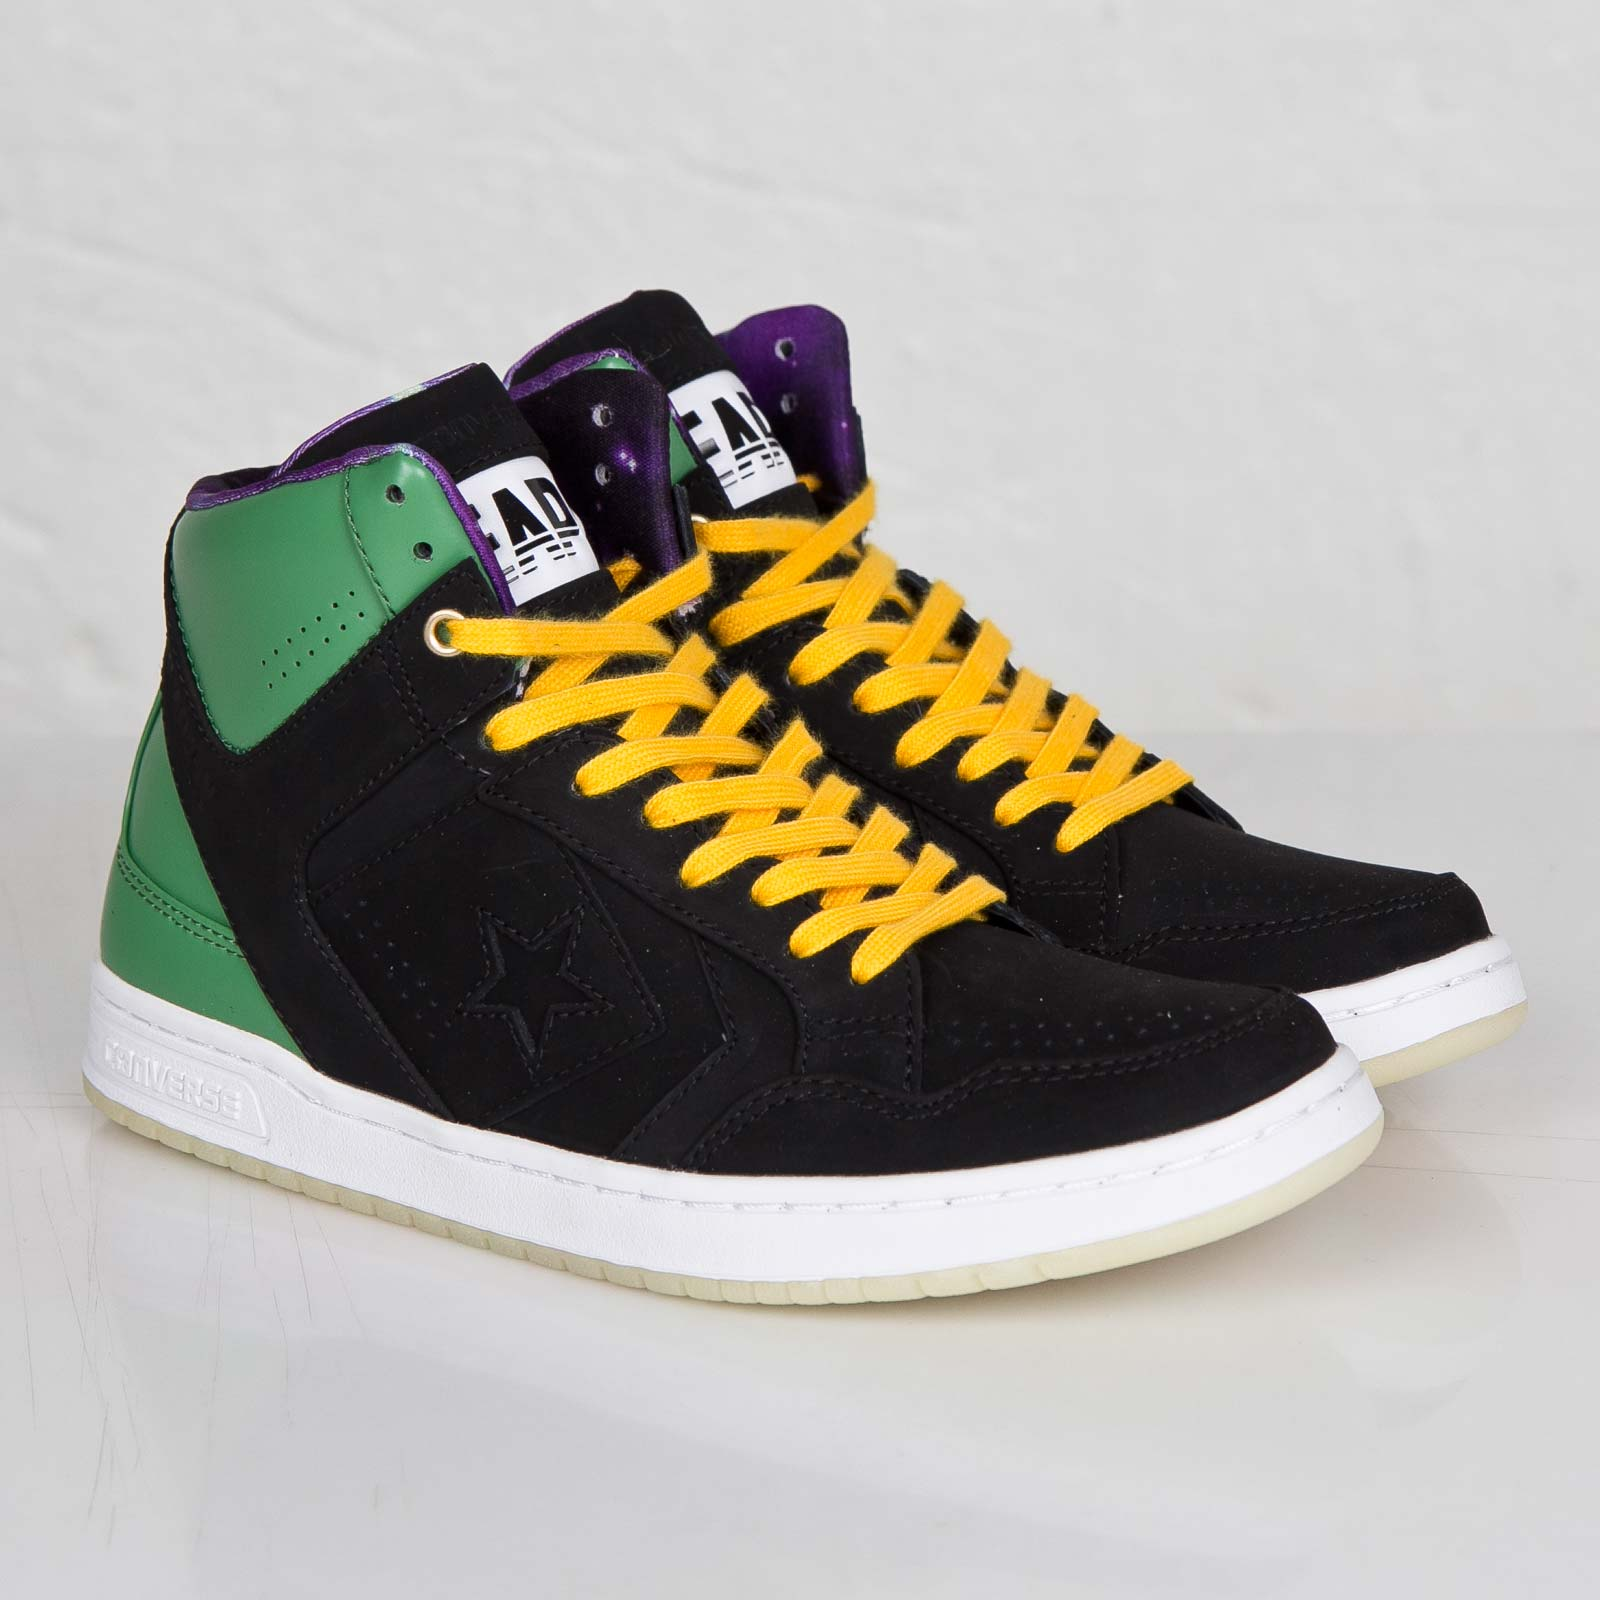 bloquear cartel Departamento  Converse Weapon Invader Mid - 146940c - Sneakersnstuff I Sneakers &  Streetwear online seit 1999